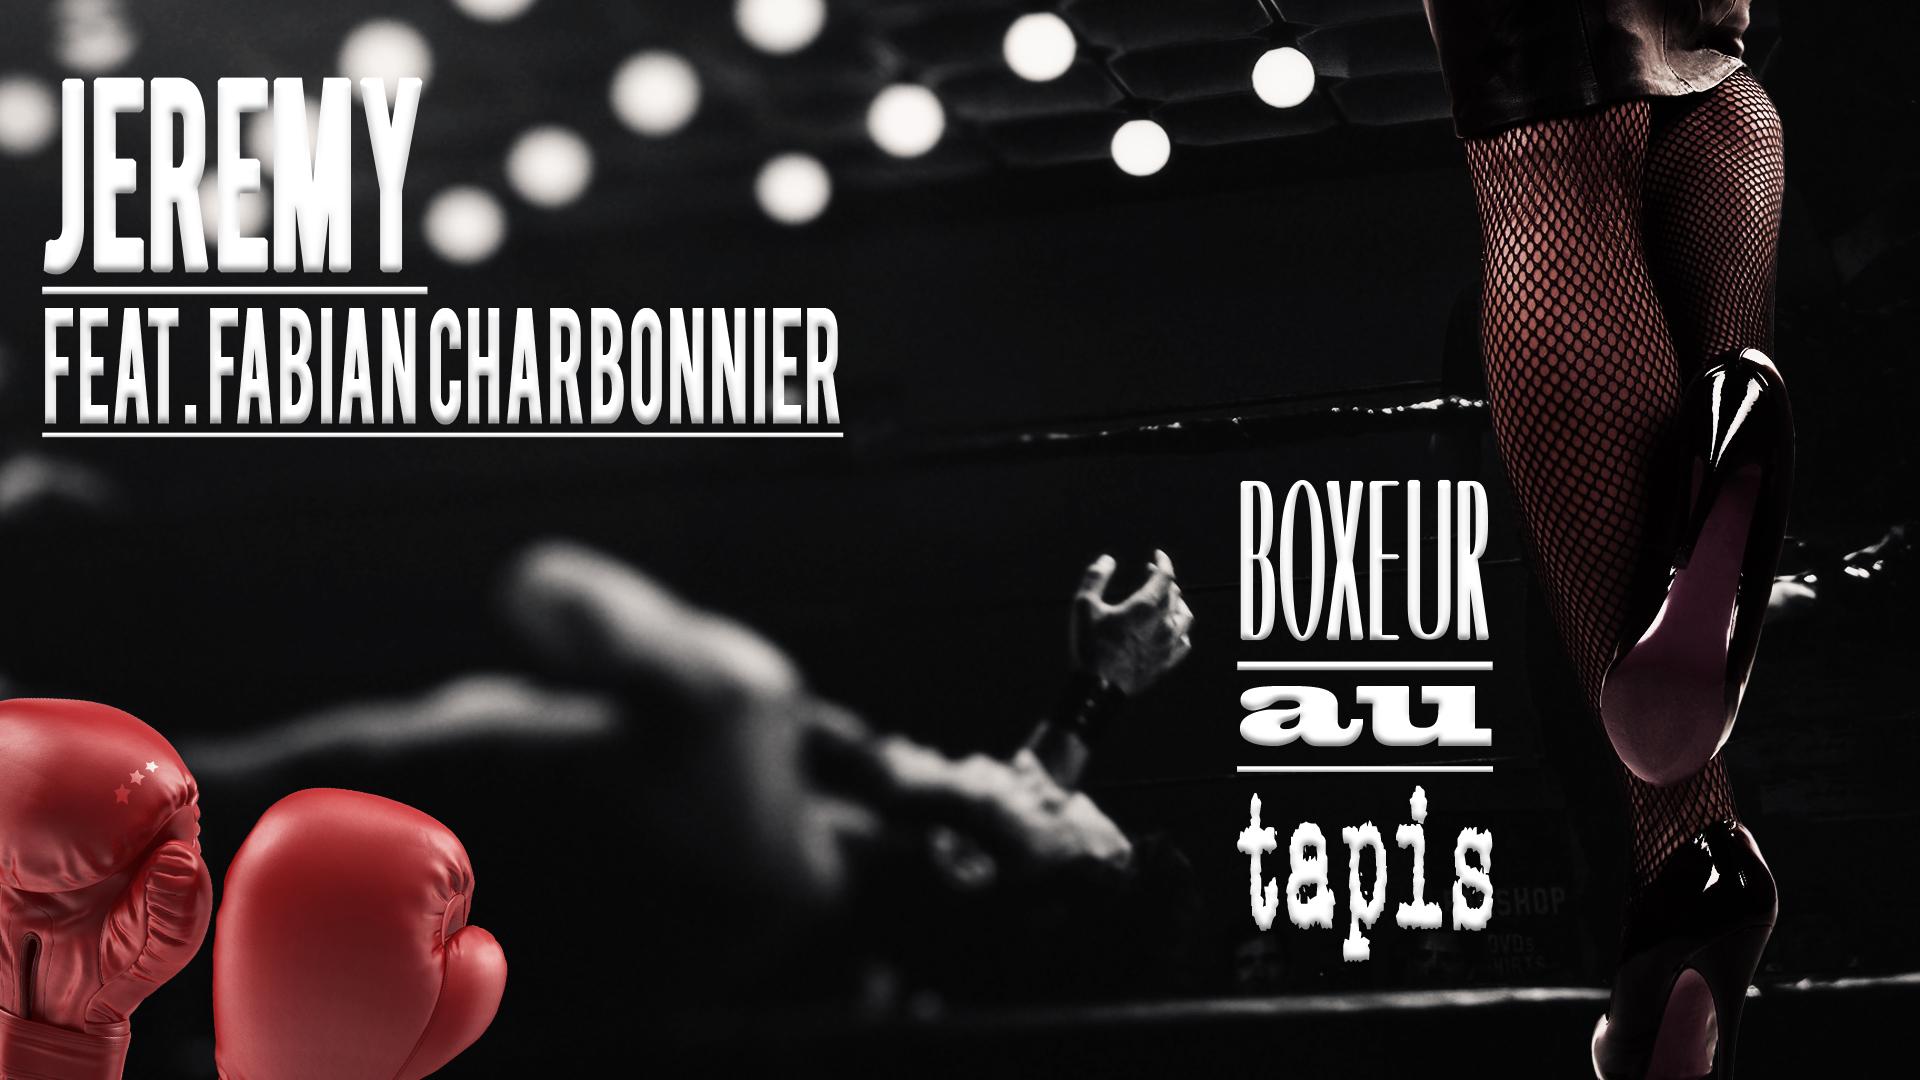 Jeremy - Boxeur au Tapis